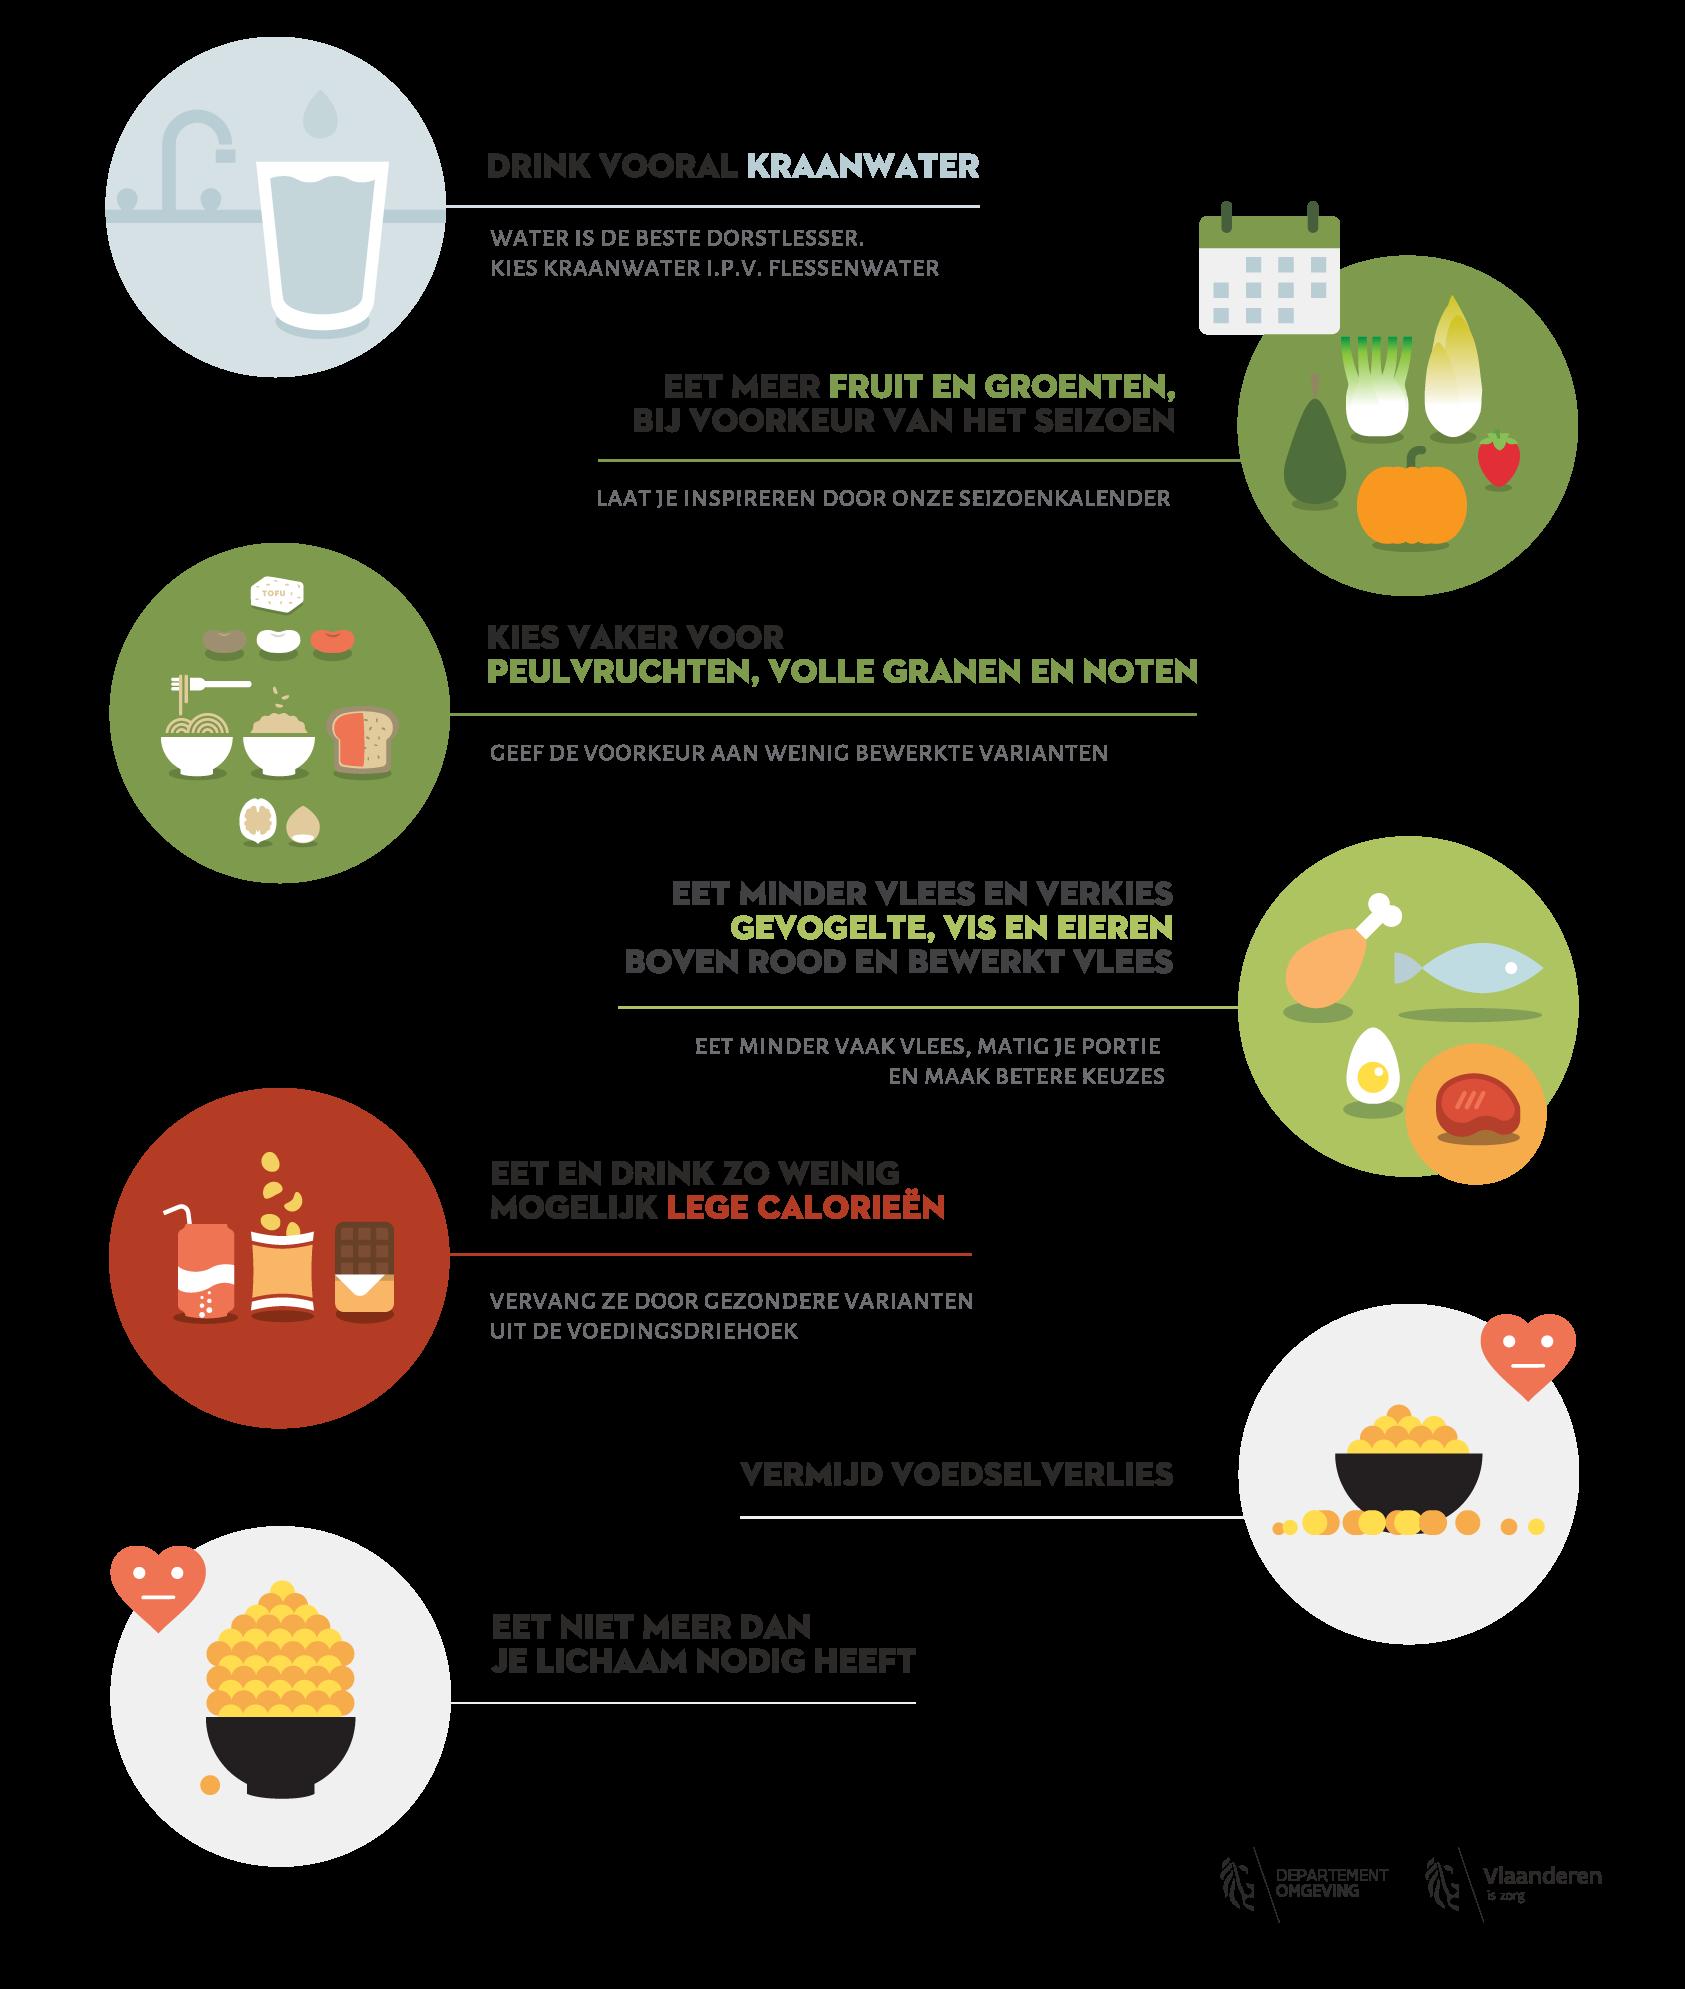 GL infographic duurzaamheid milieuverantwoord rgb